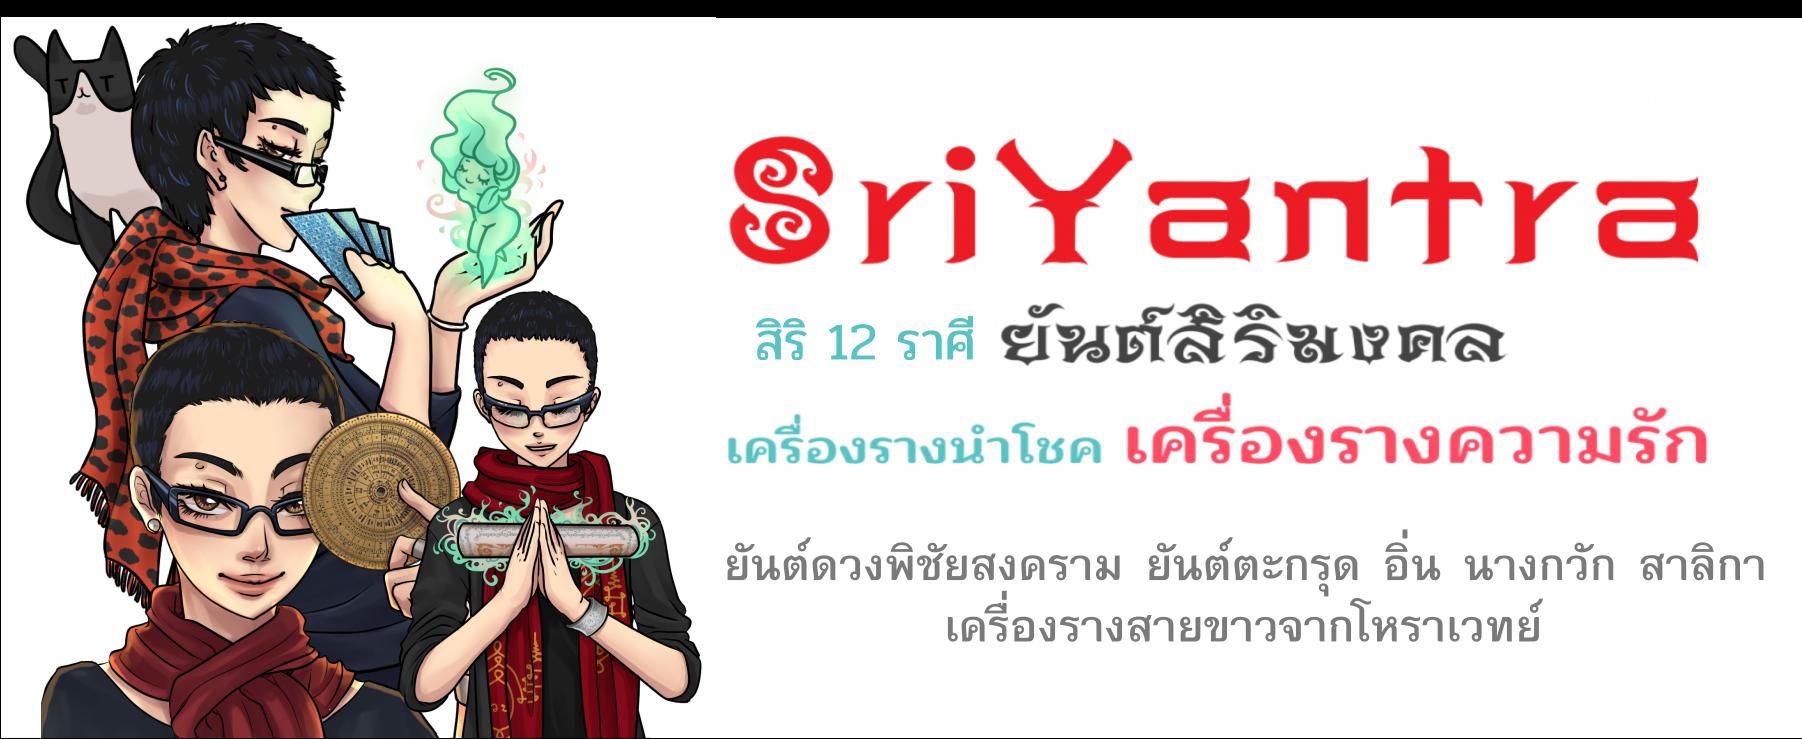 ThaiSriYanTra.com ศรียันตรา